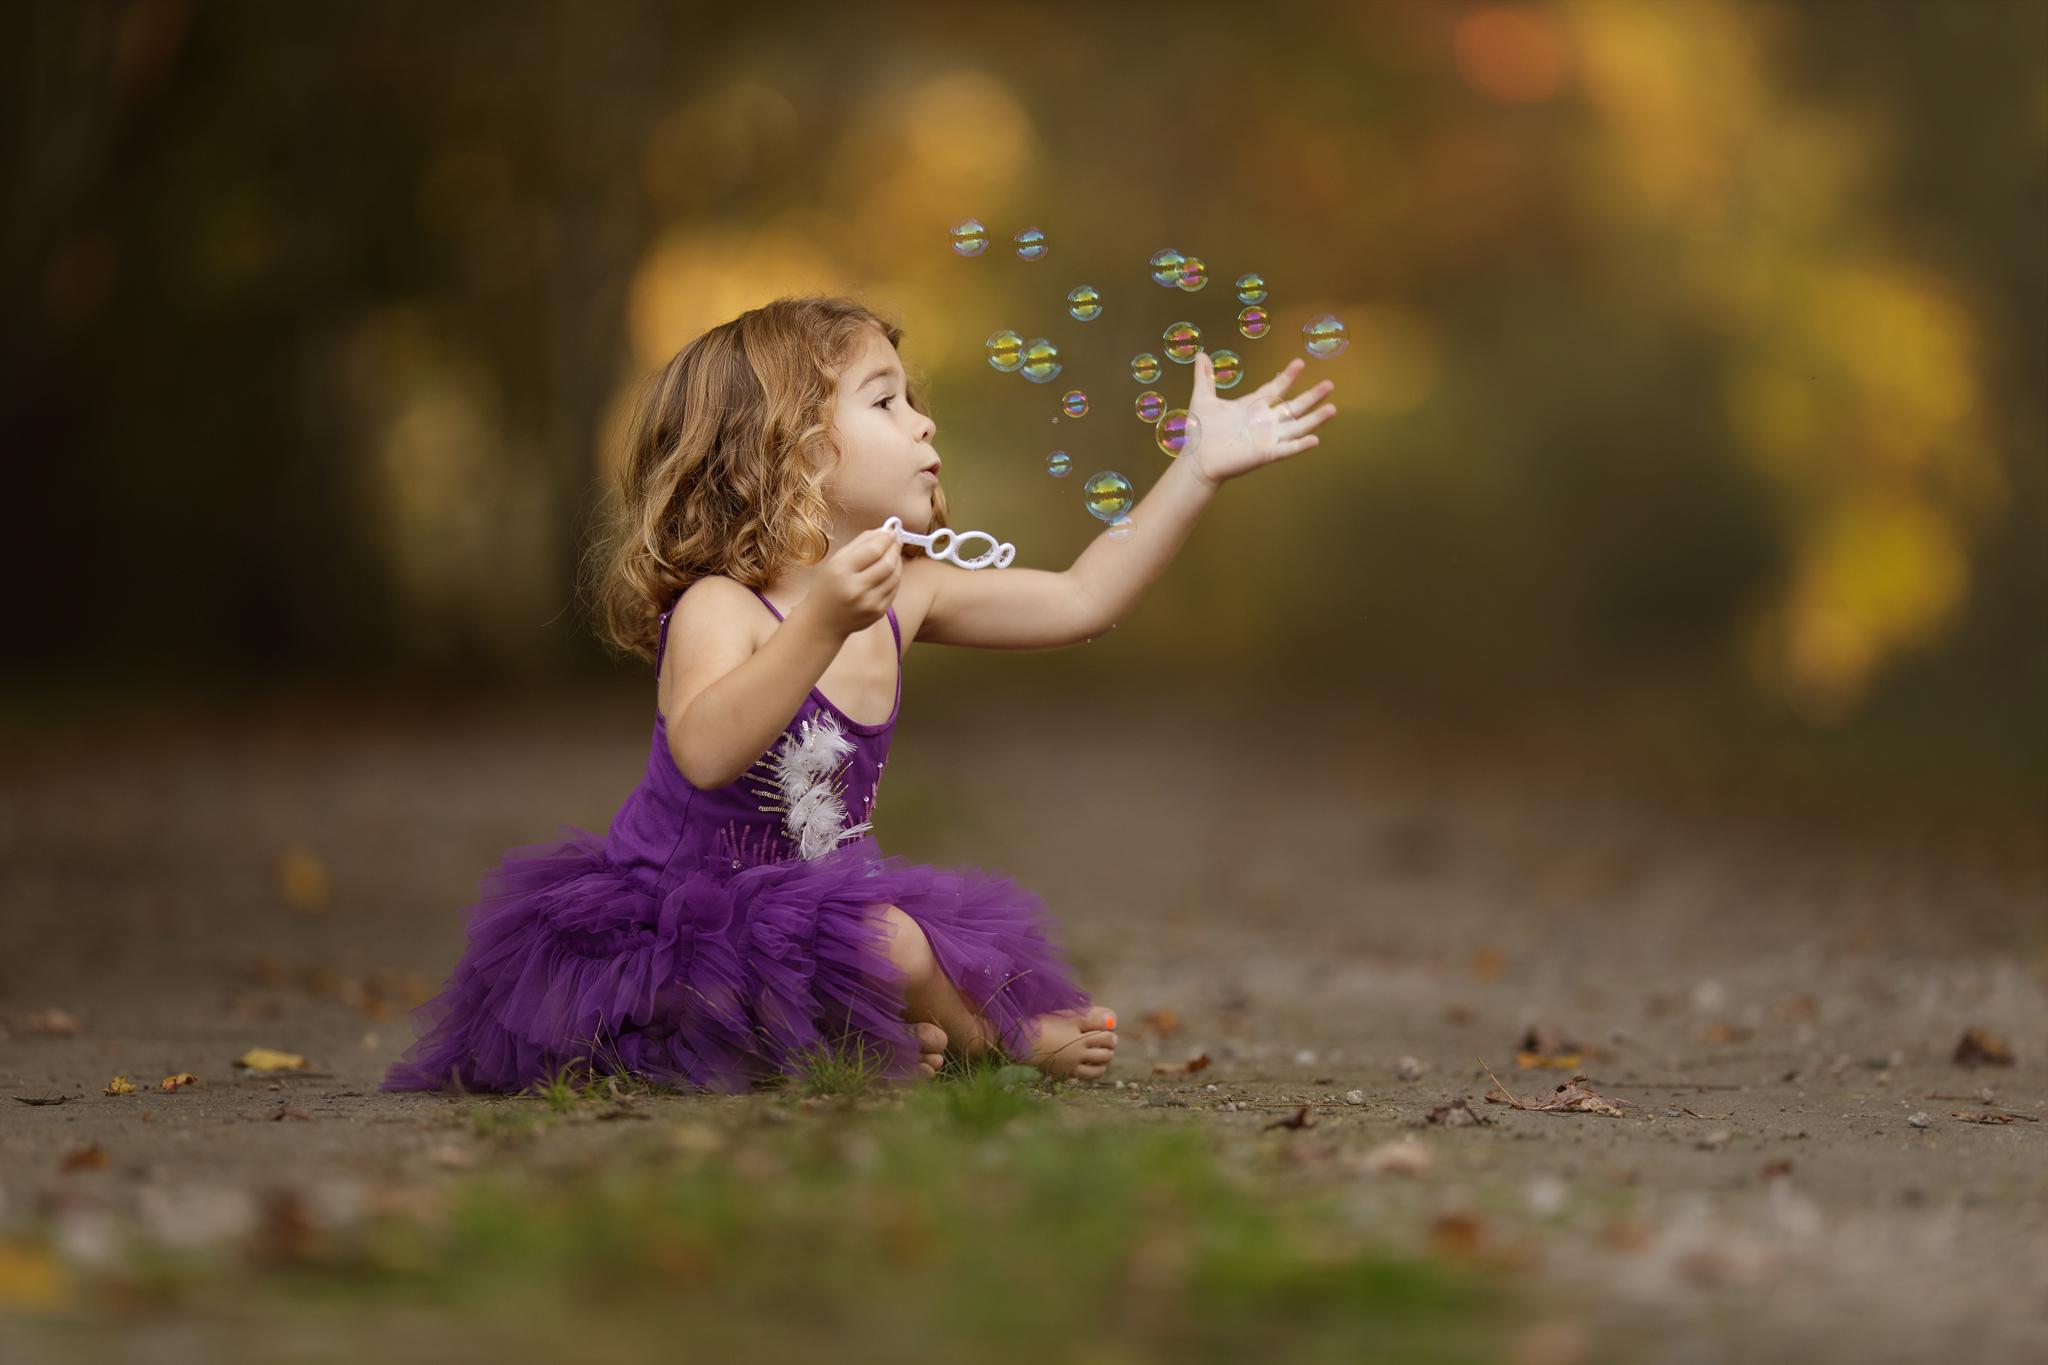 LITTLE GIRL WITH BUBBLES IN Narragansett, RI